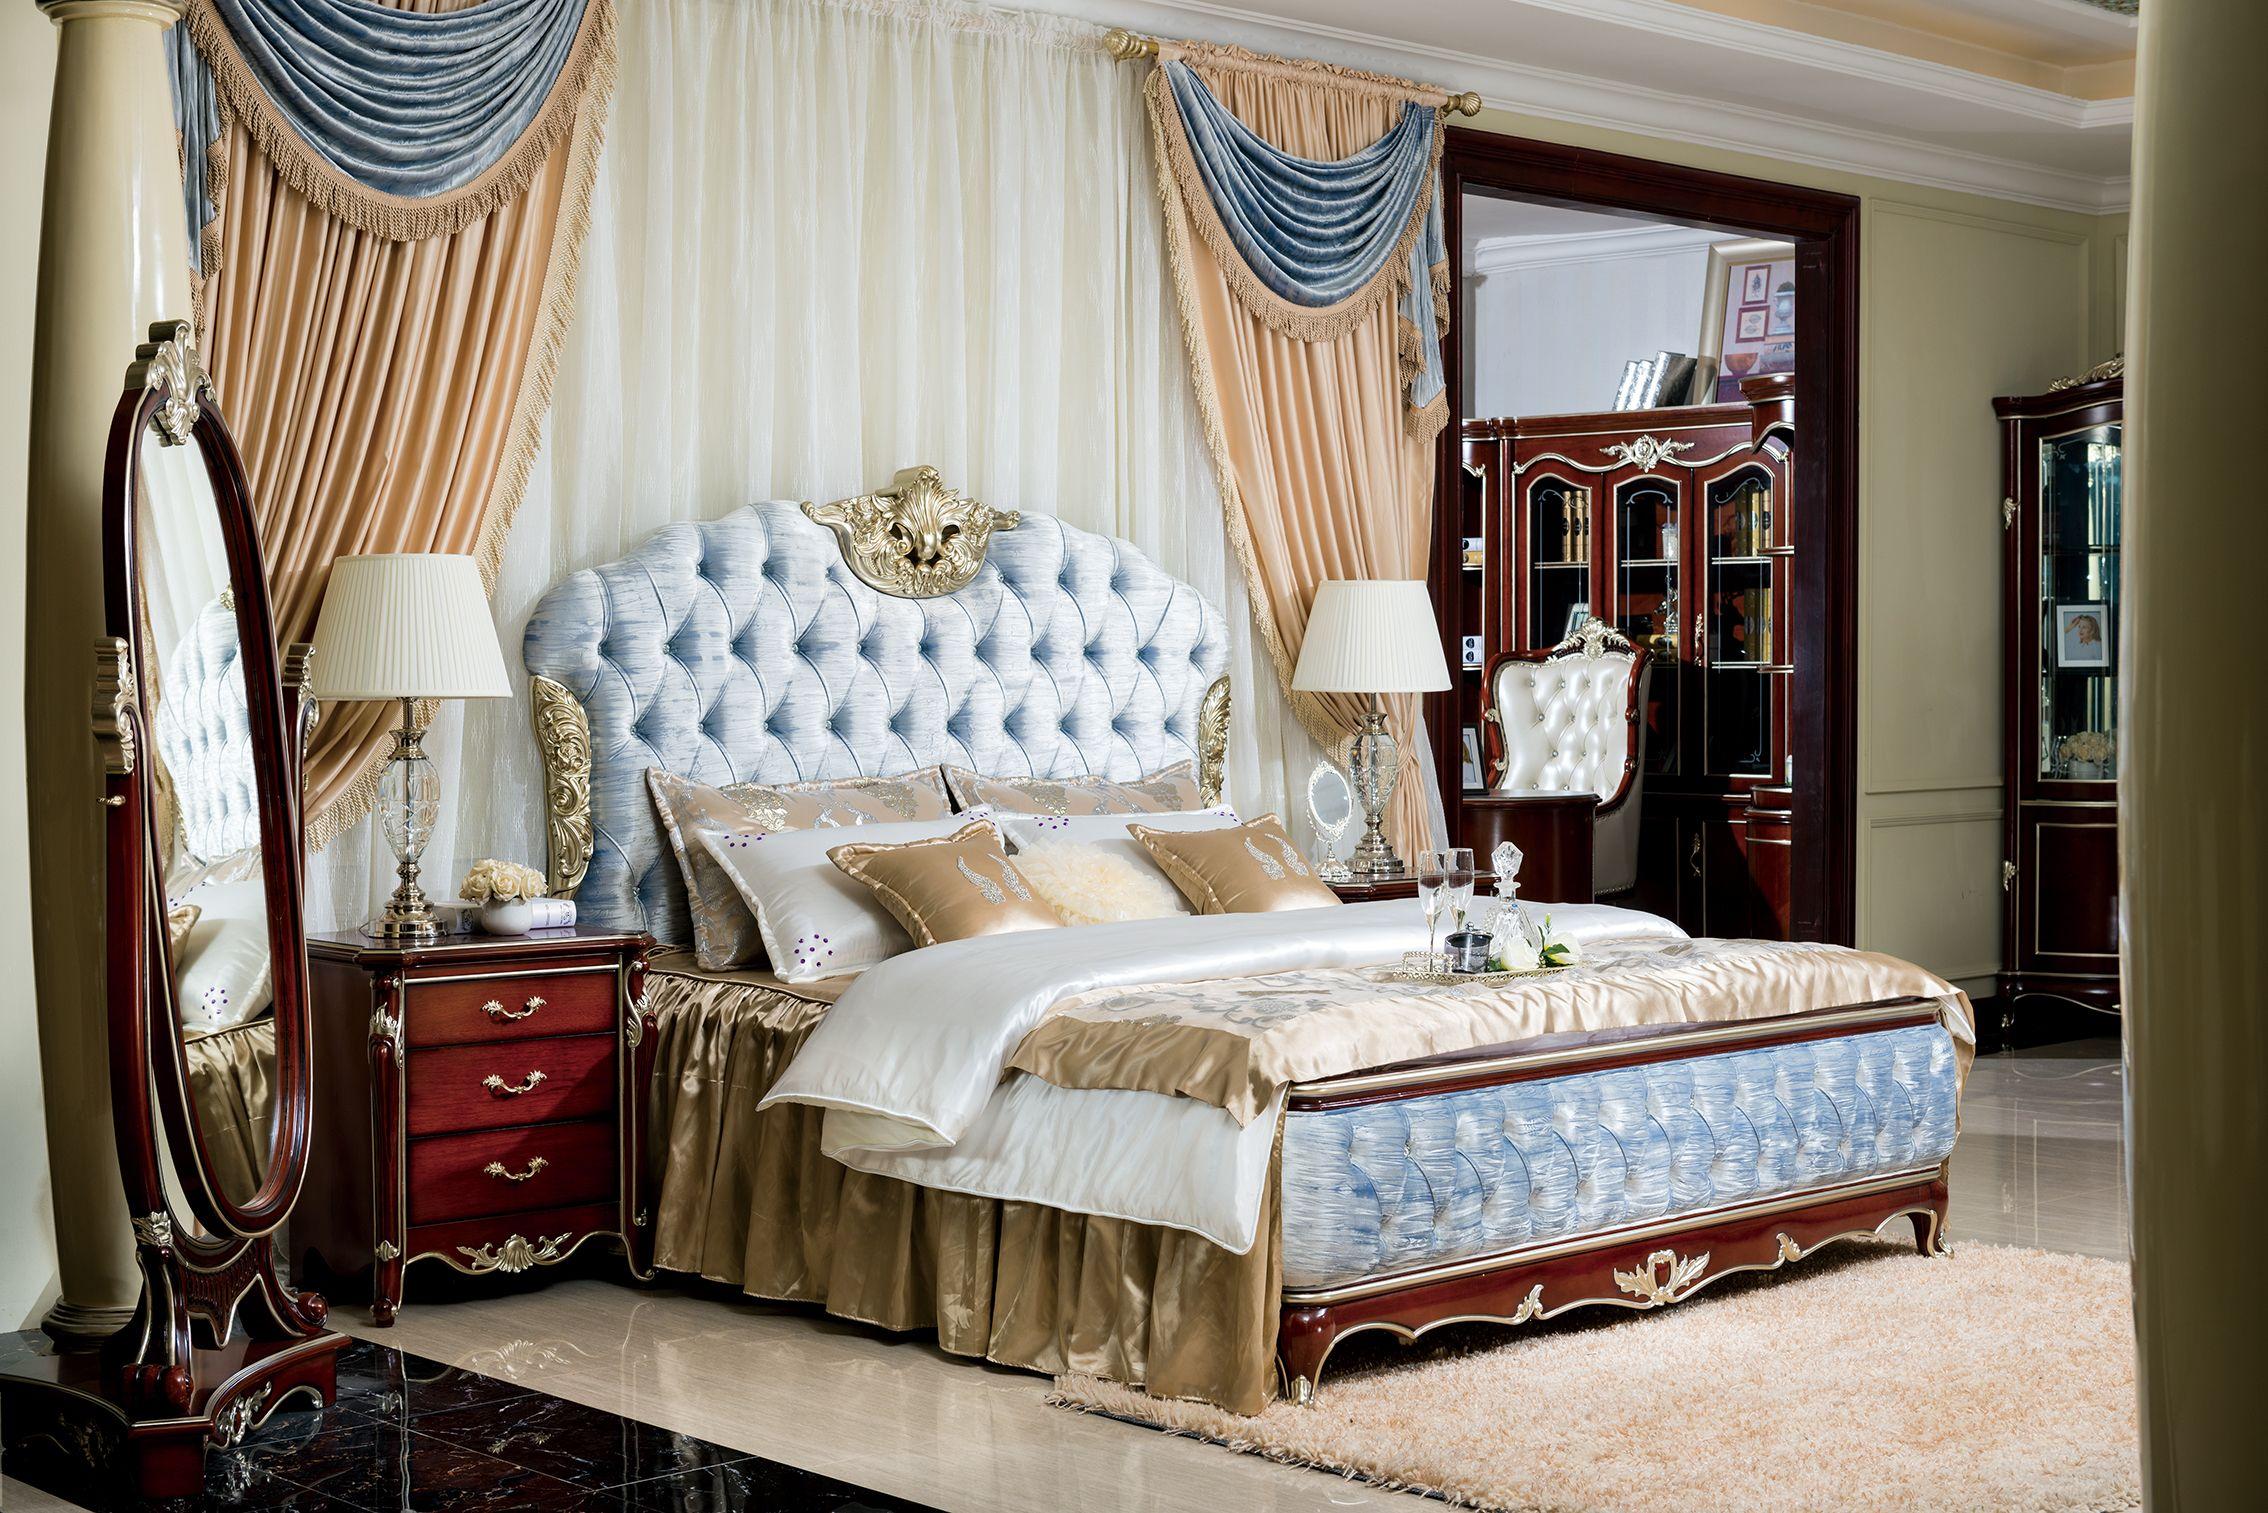 bedroom set 3 Bedroom set, European furniture